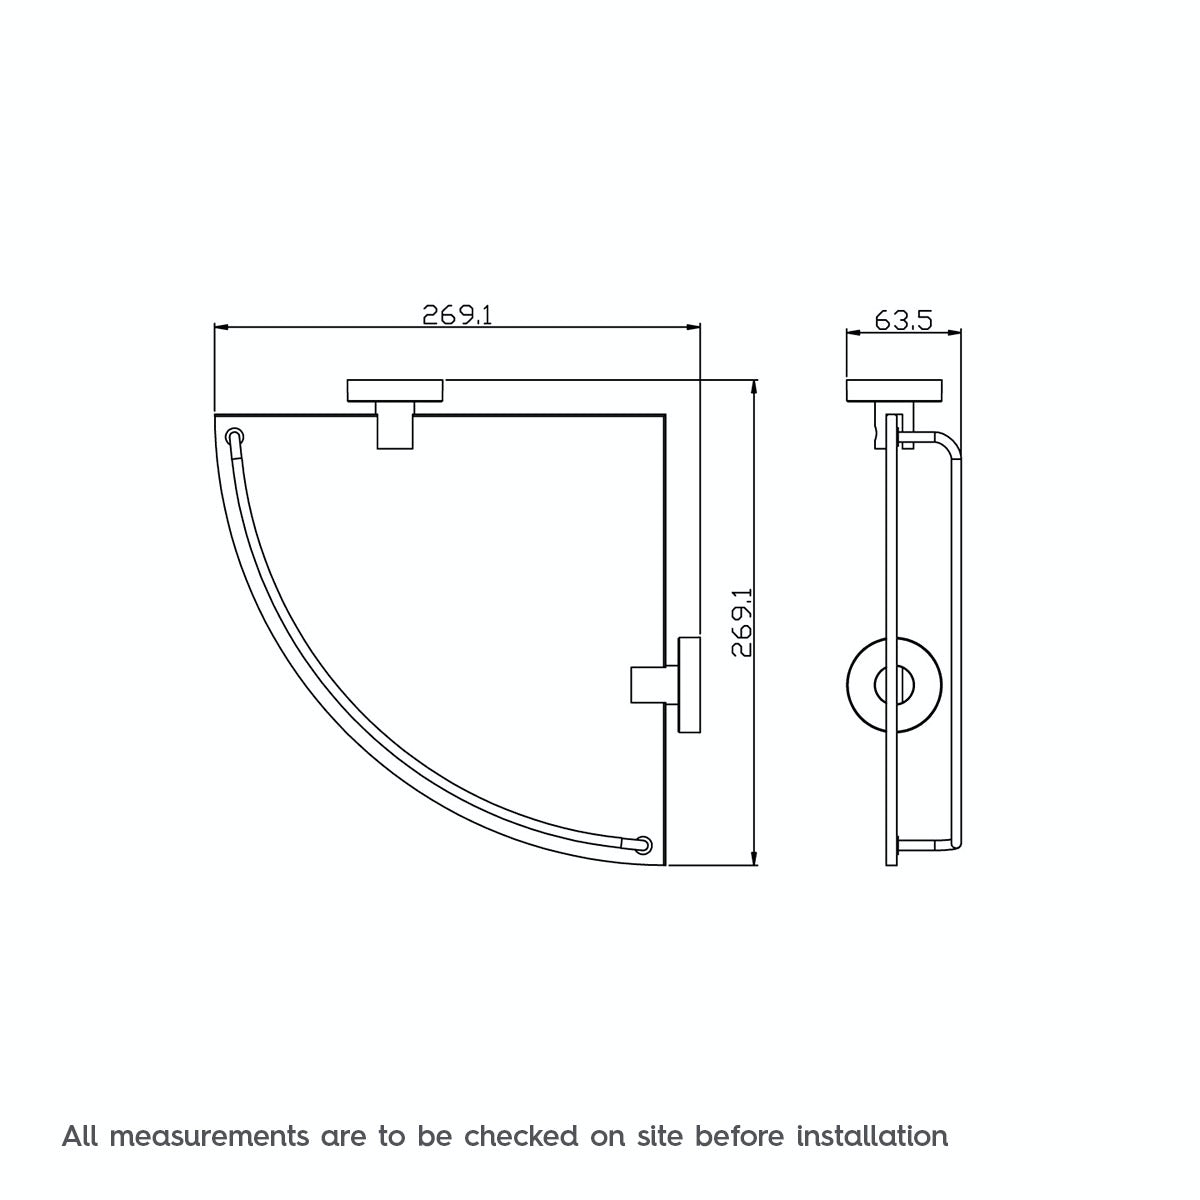 Dimensions for Orchard Matrix glass corner shelf